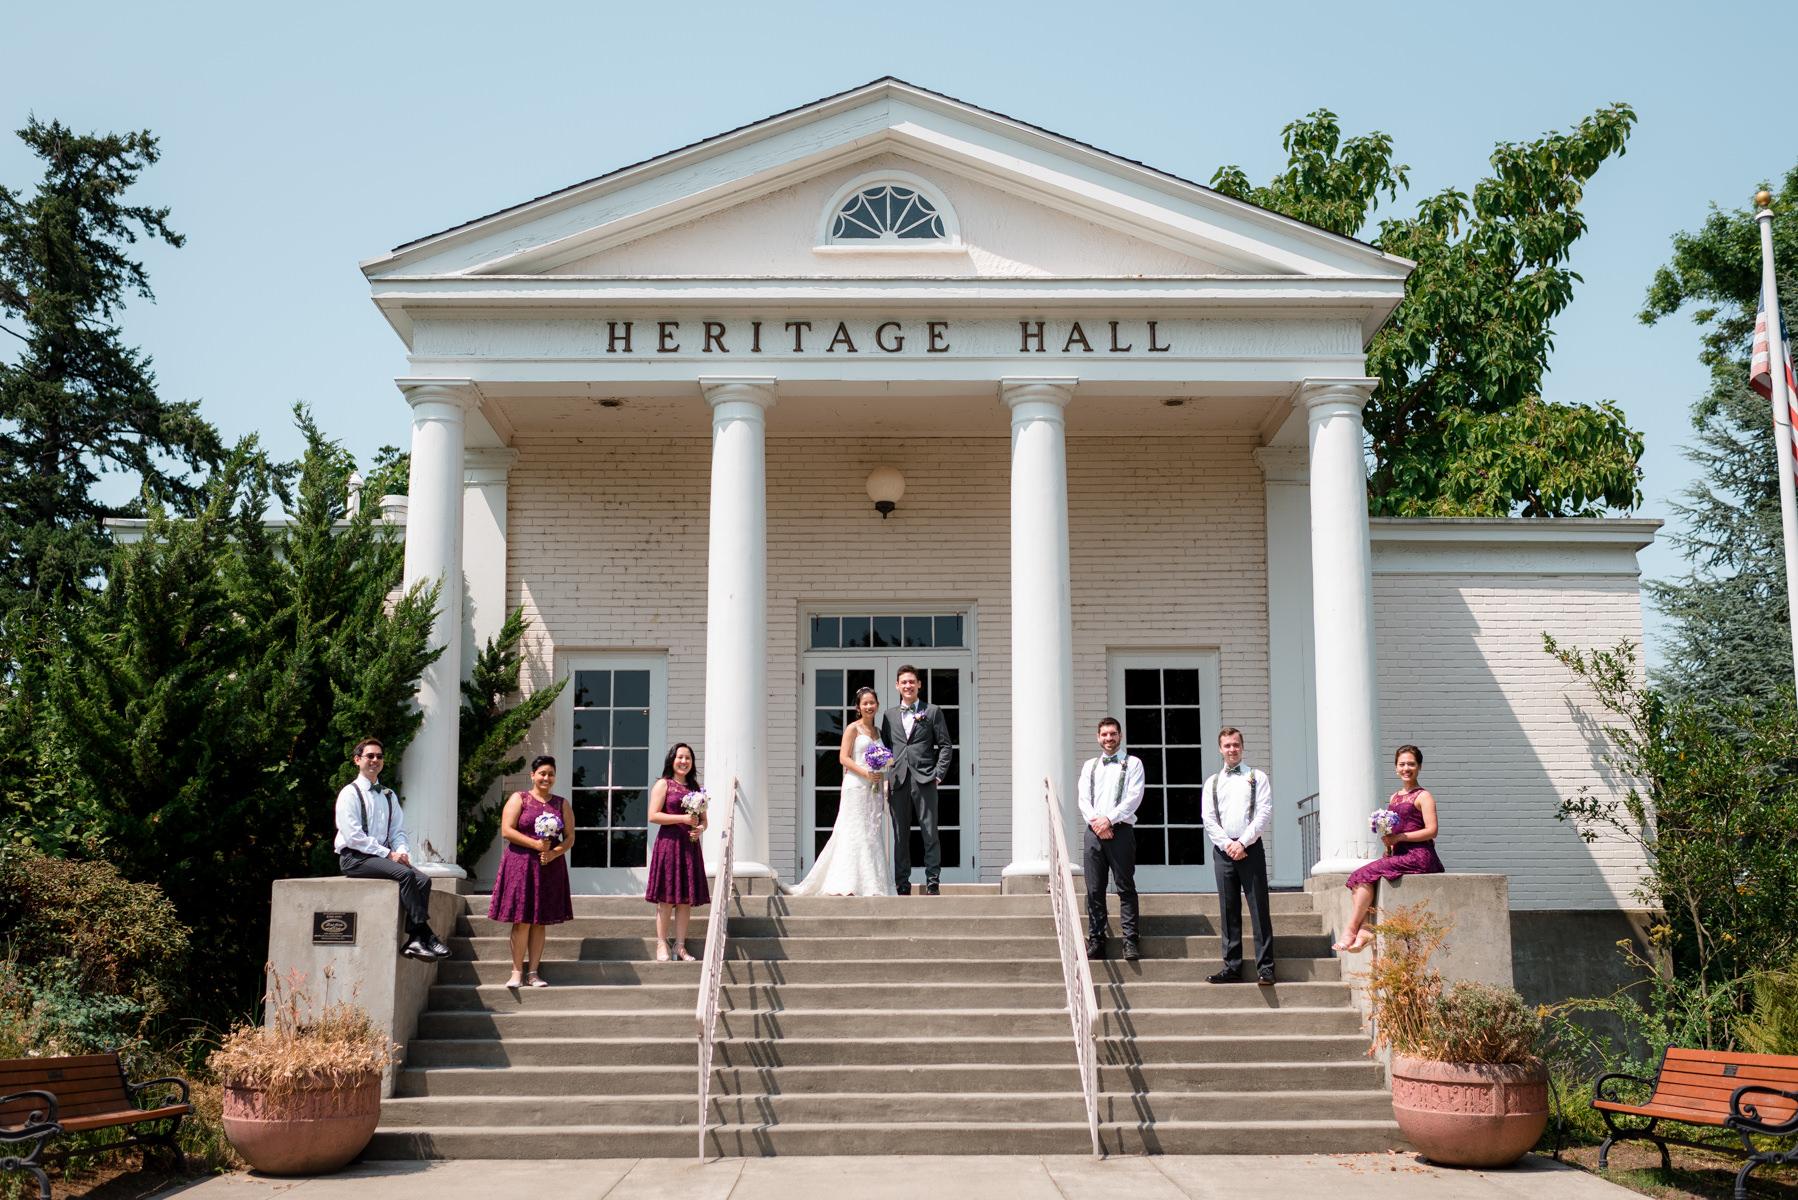 Andrew Tat - Documentary Wedding Photography - Heritage Hall - Kirkland, Washington - Grace & James - 10.JPG